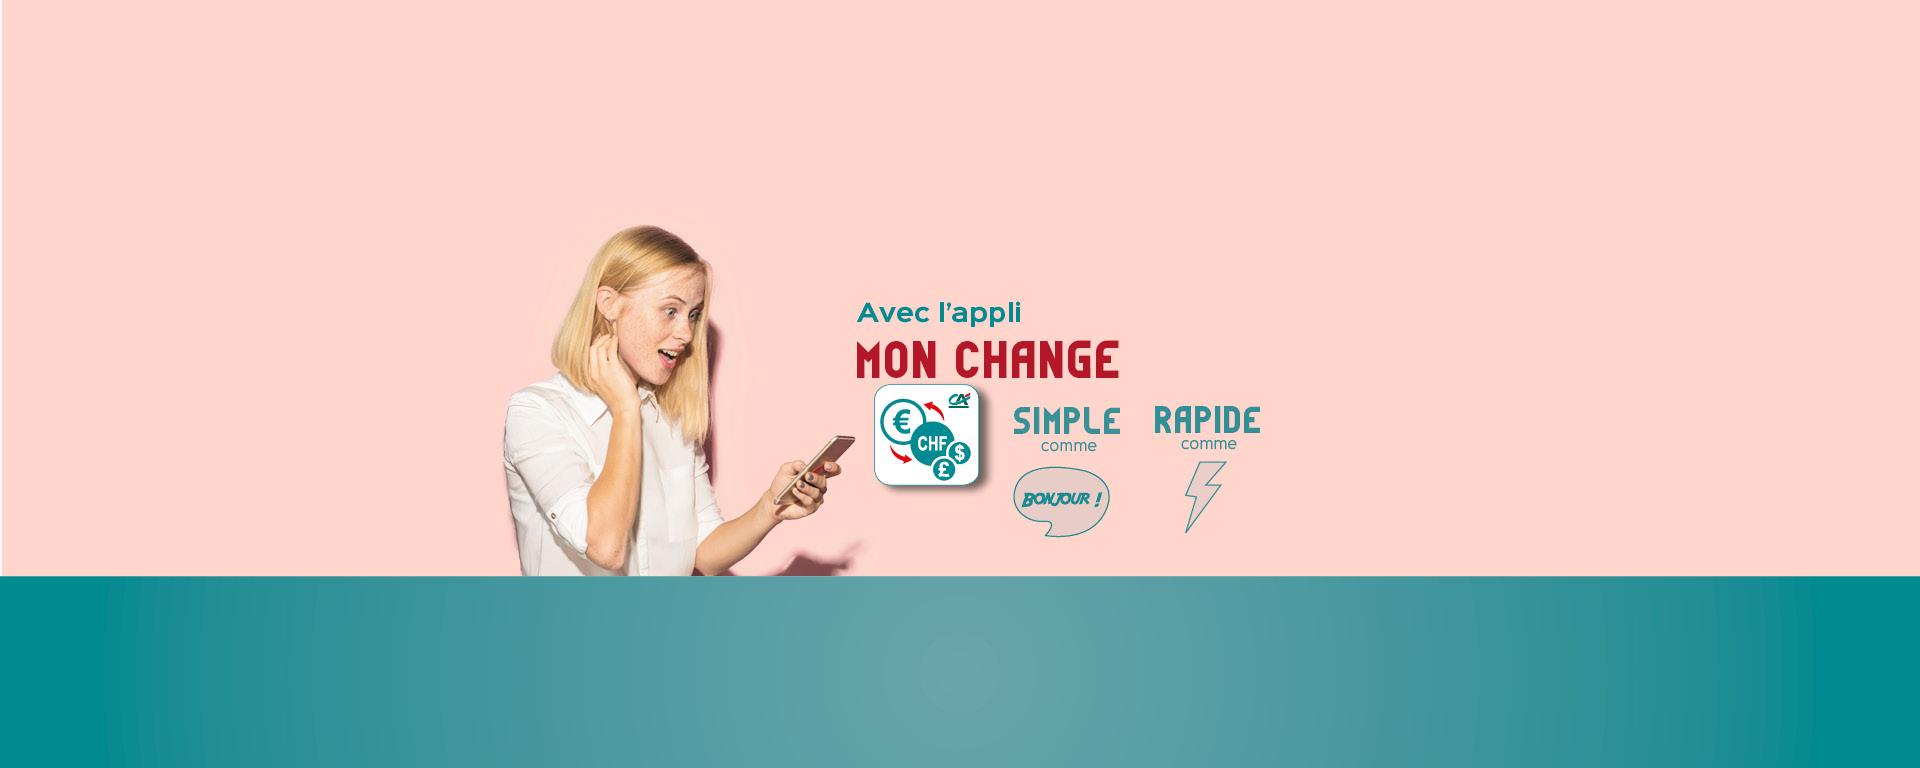 MON CHANGE